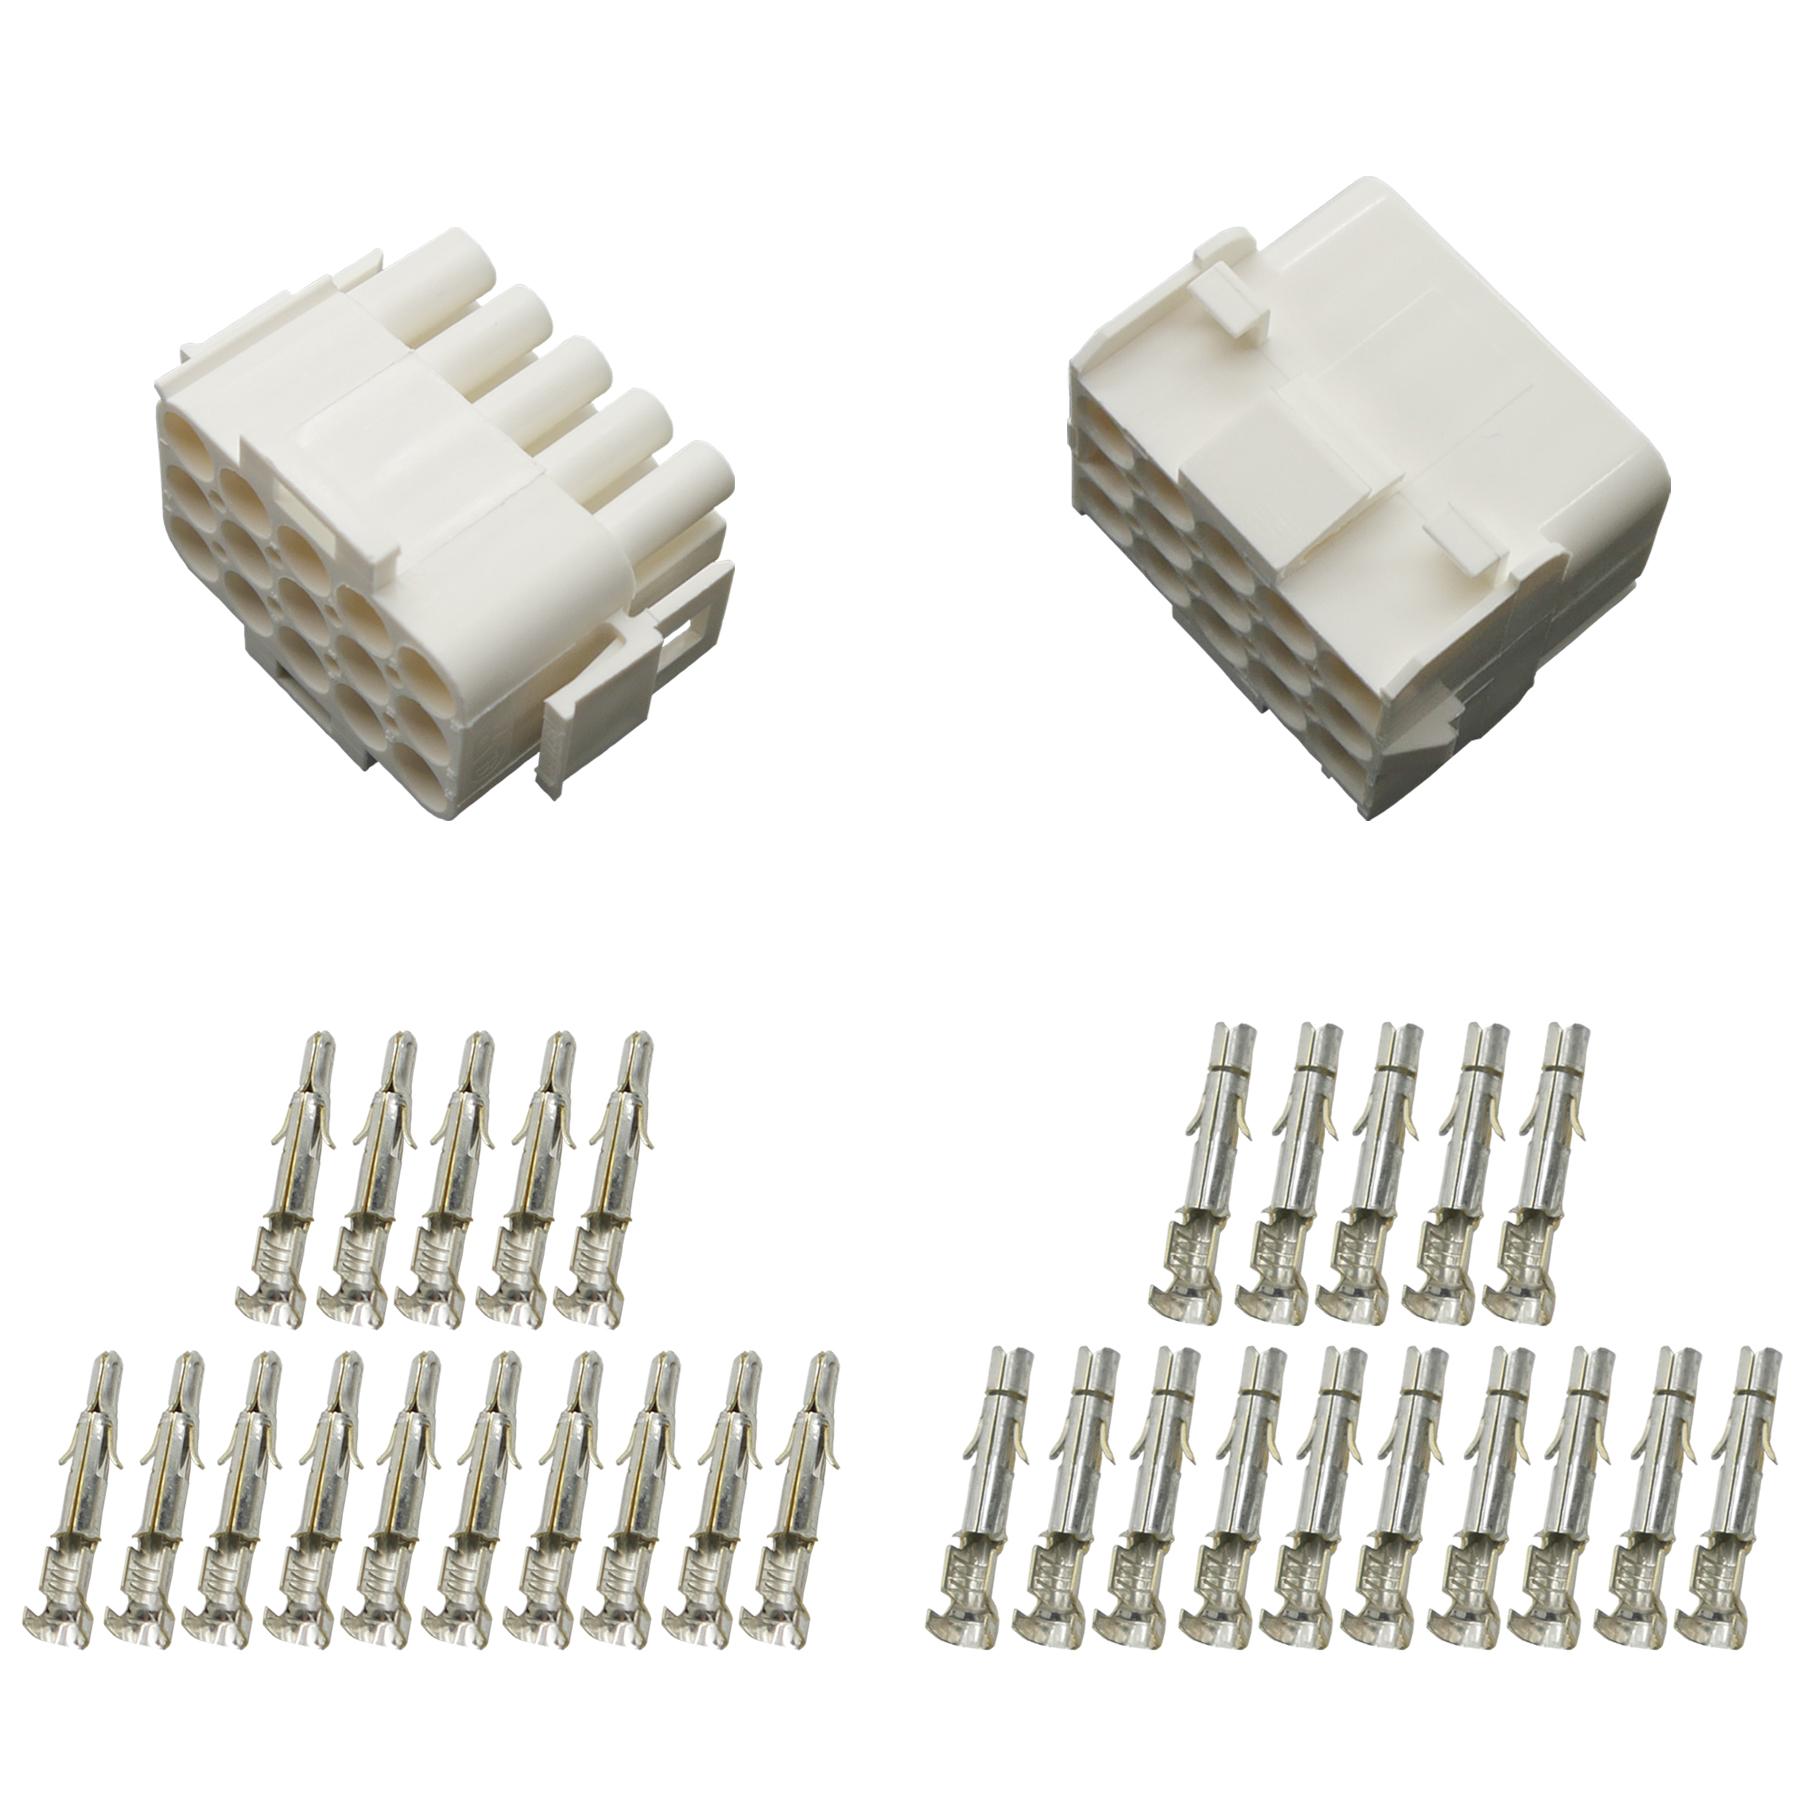 Stecker Set Steckverbinder Universal Mate N Lok 4-polig incl Kontakten